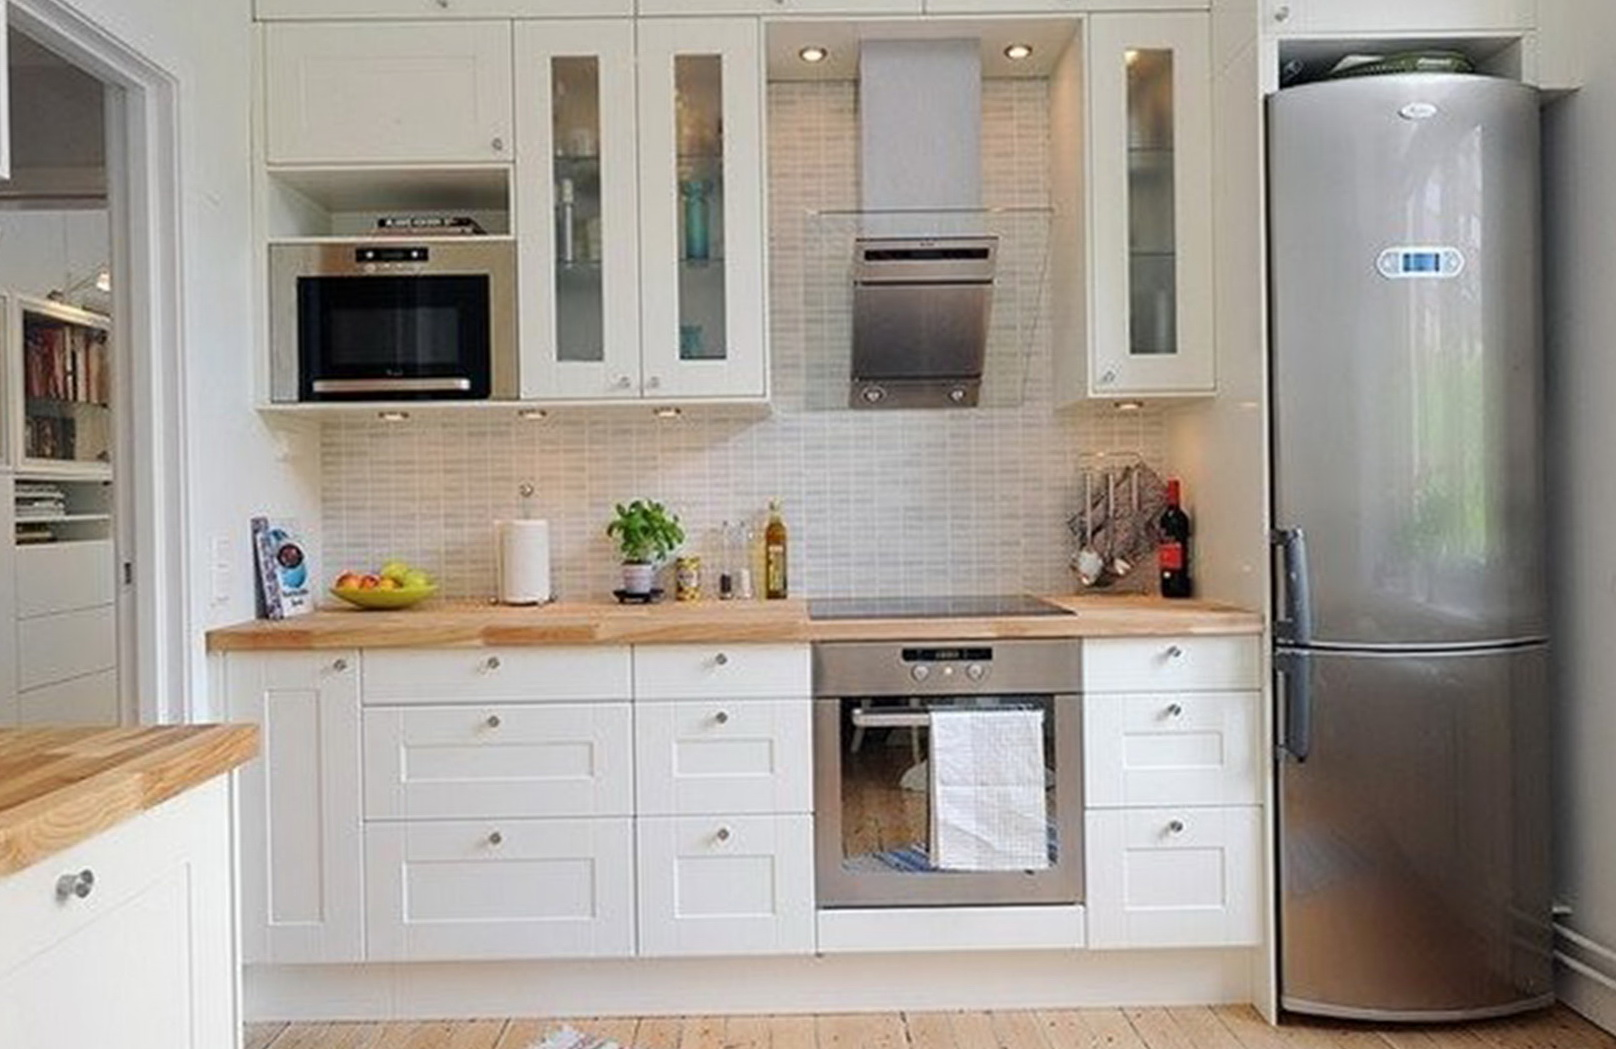 Best Kitchen Cabinets 2014best Kitchen Cabinets 2014